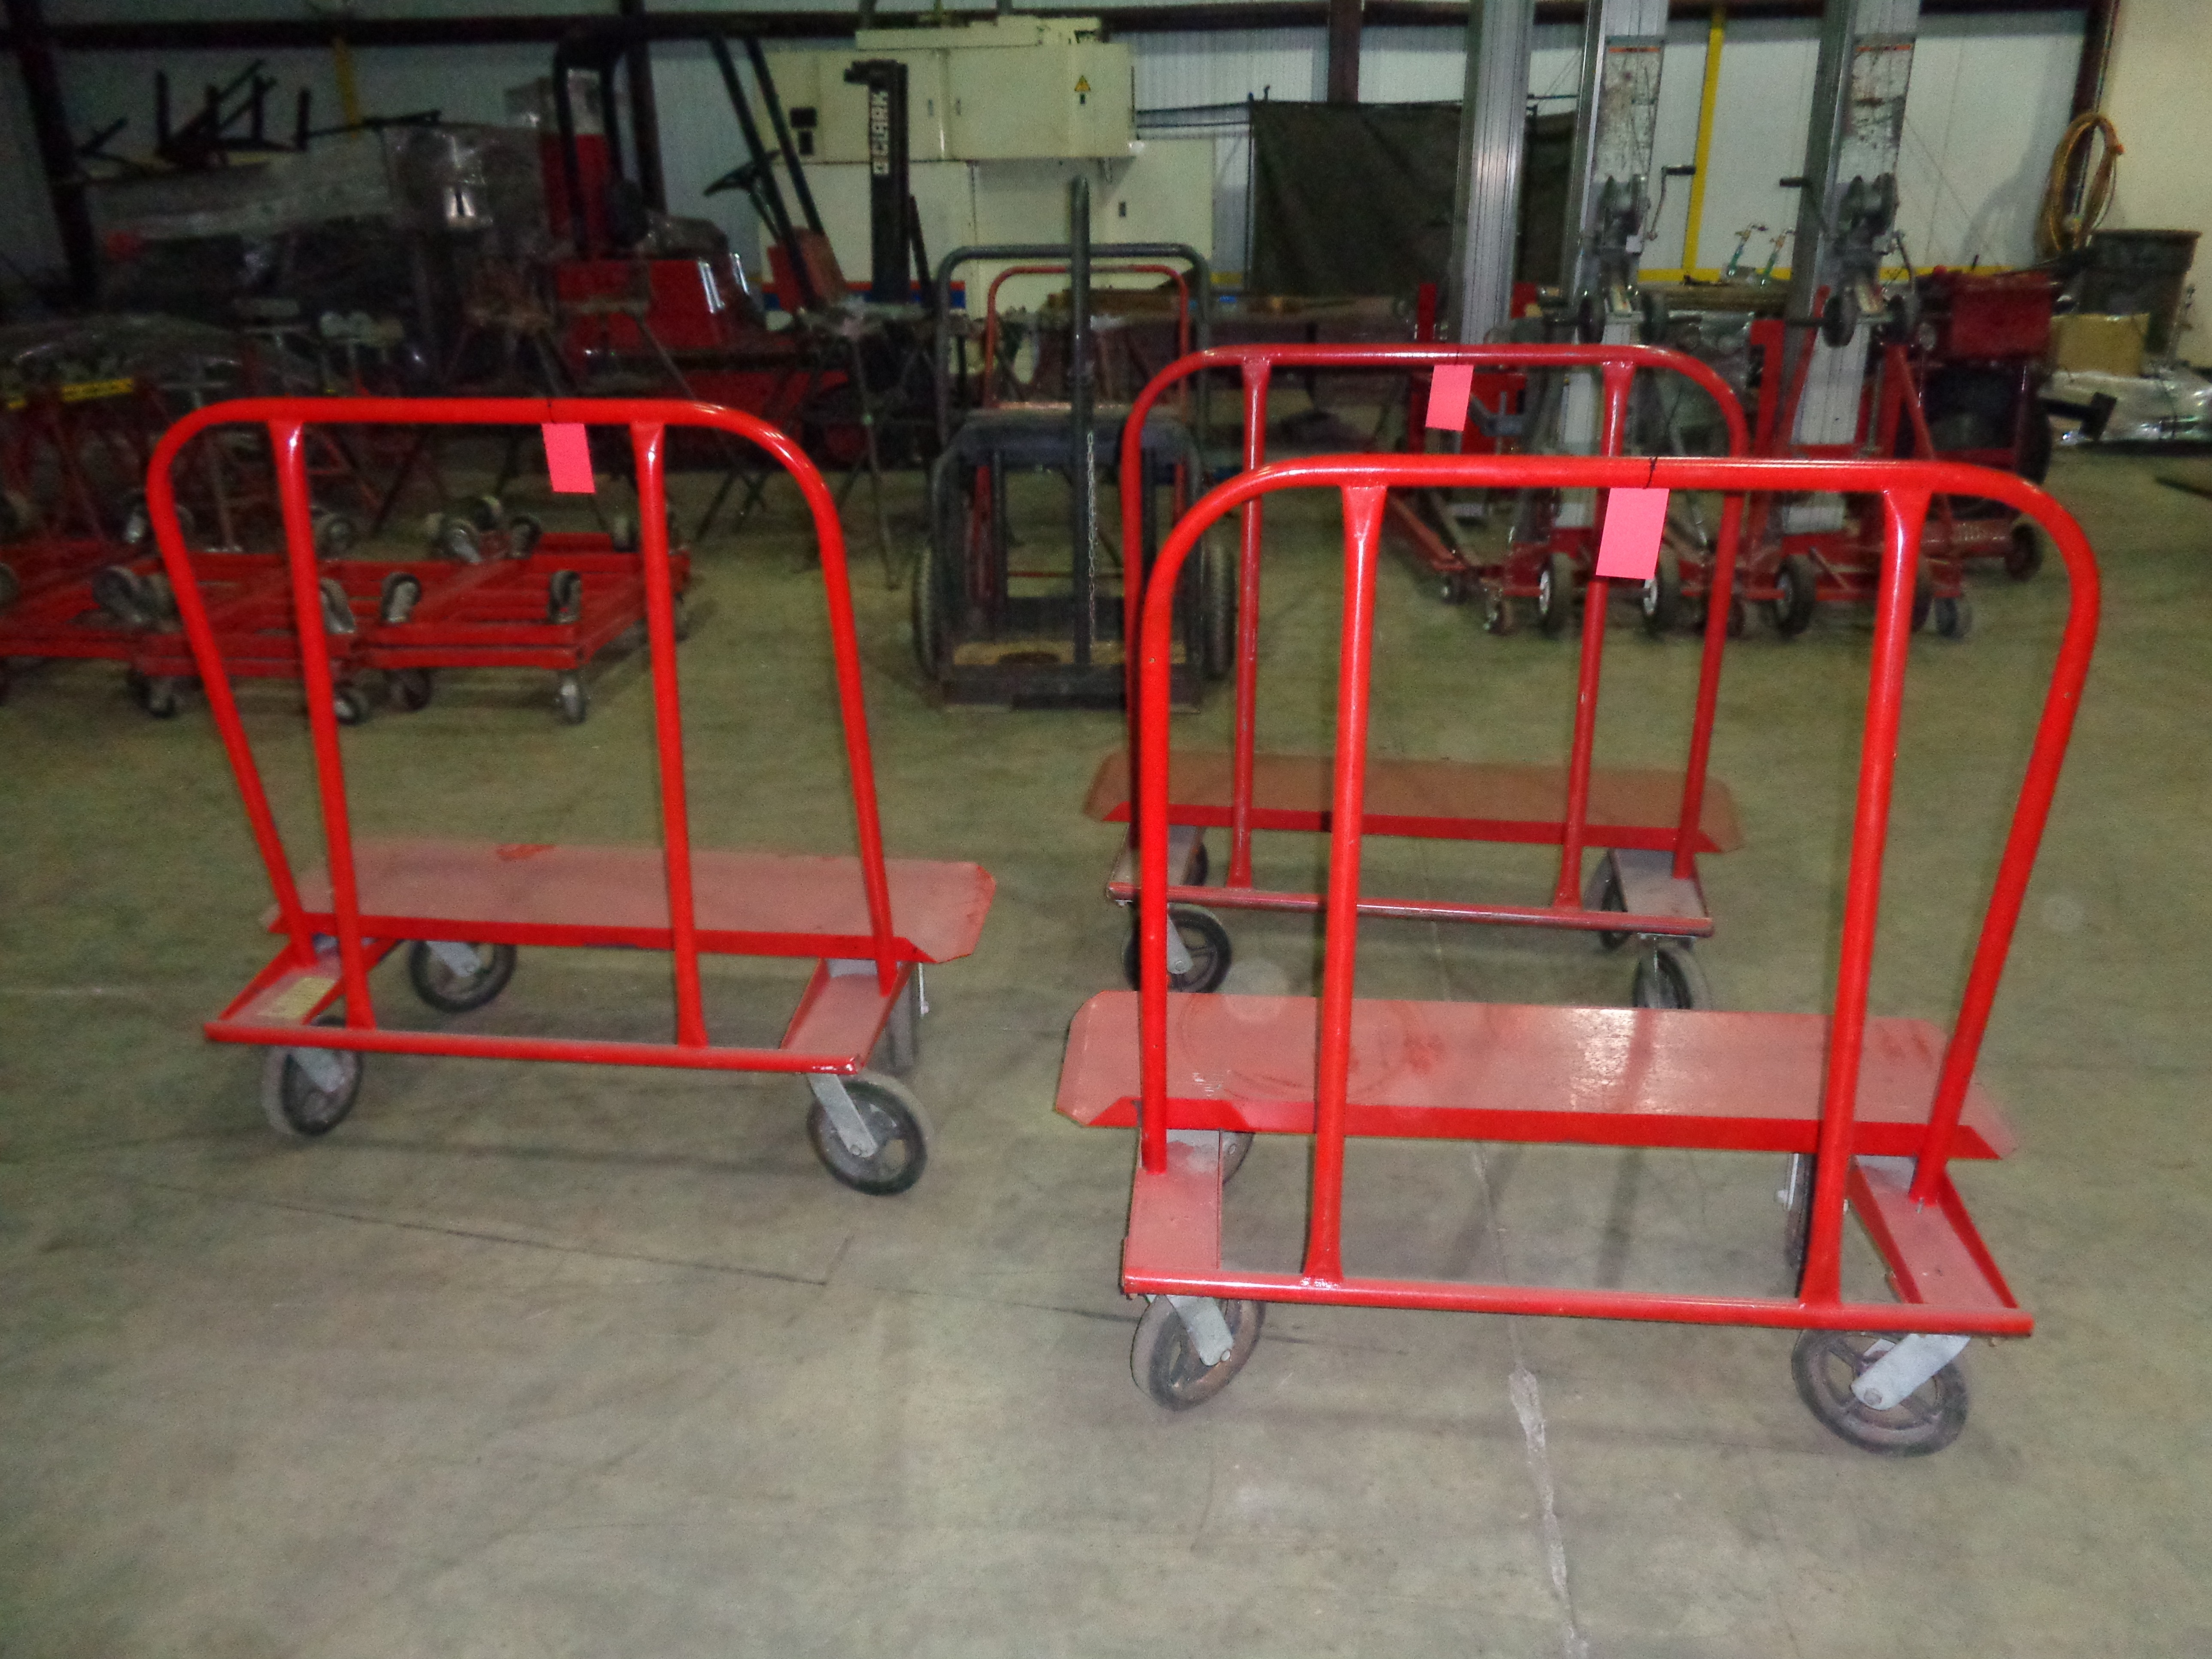 Lot of 3 - Jescraft Sheetrock Carts - Image 2 of 4